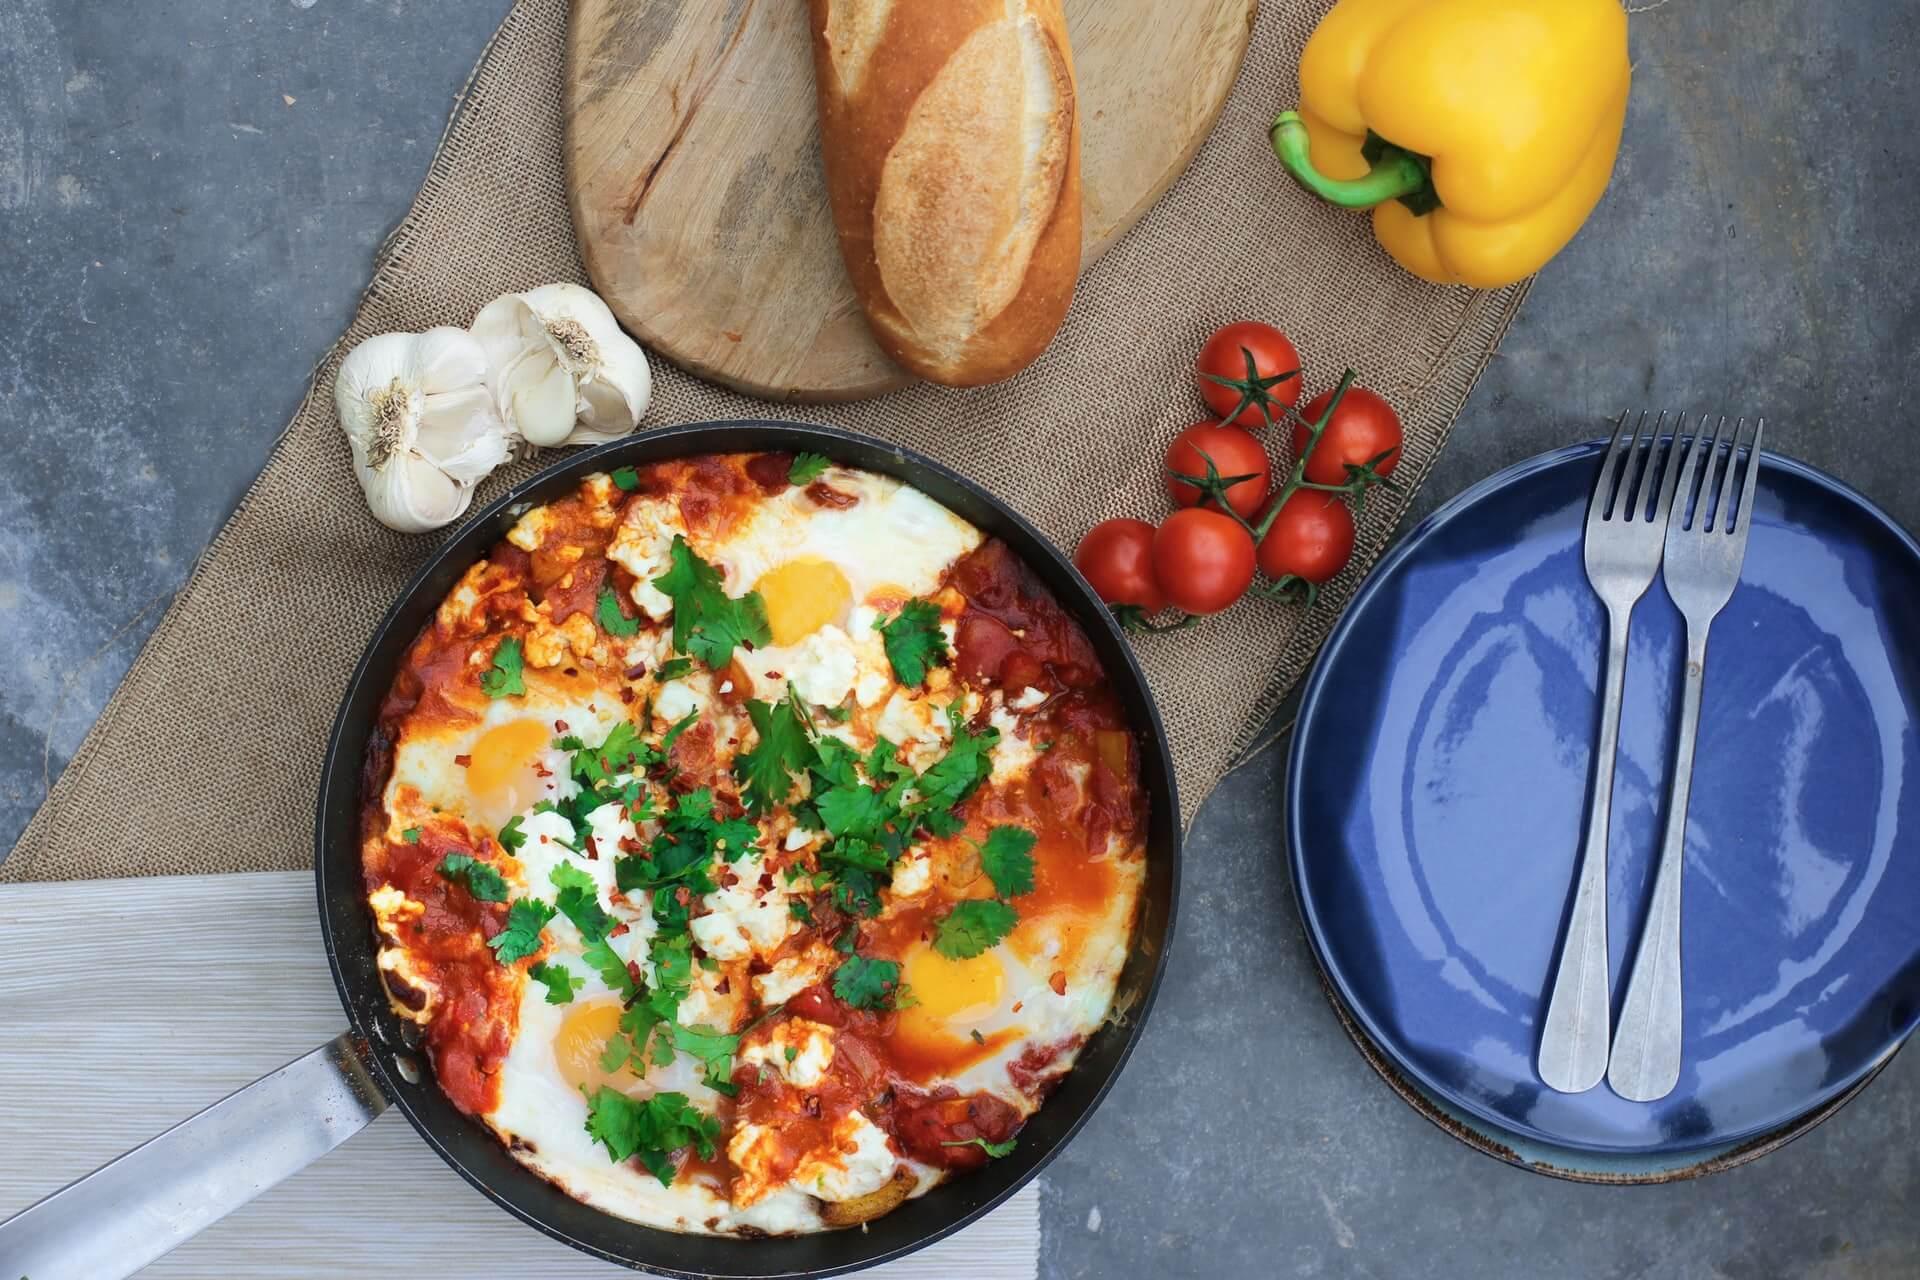 A classic Israeli breakfast food - shakshuka (shakshouka)